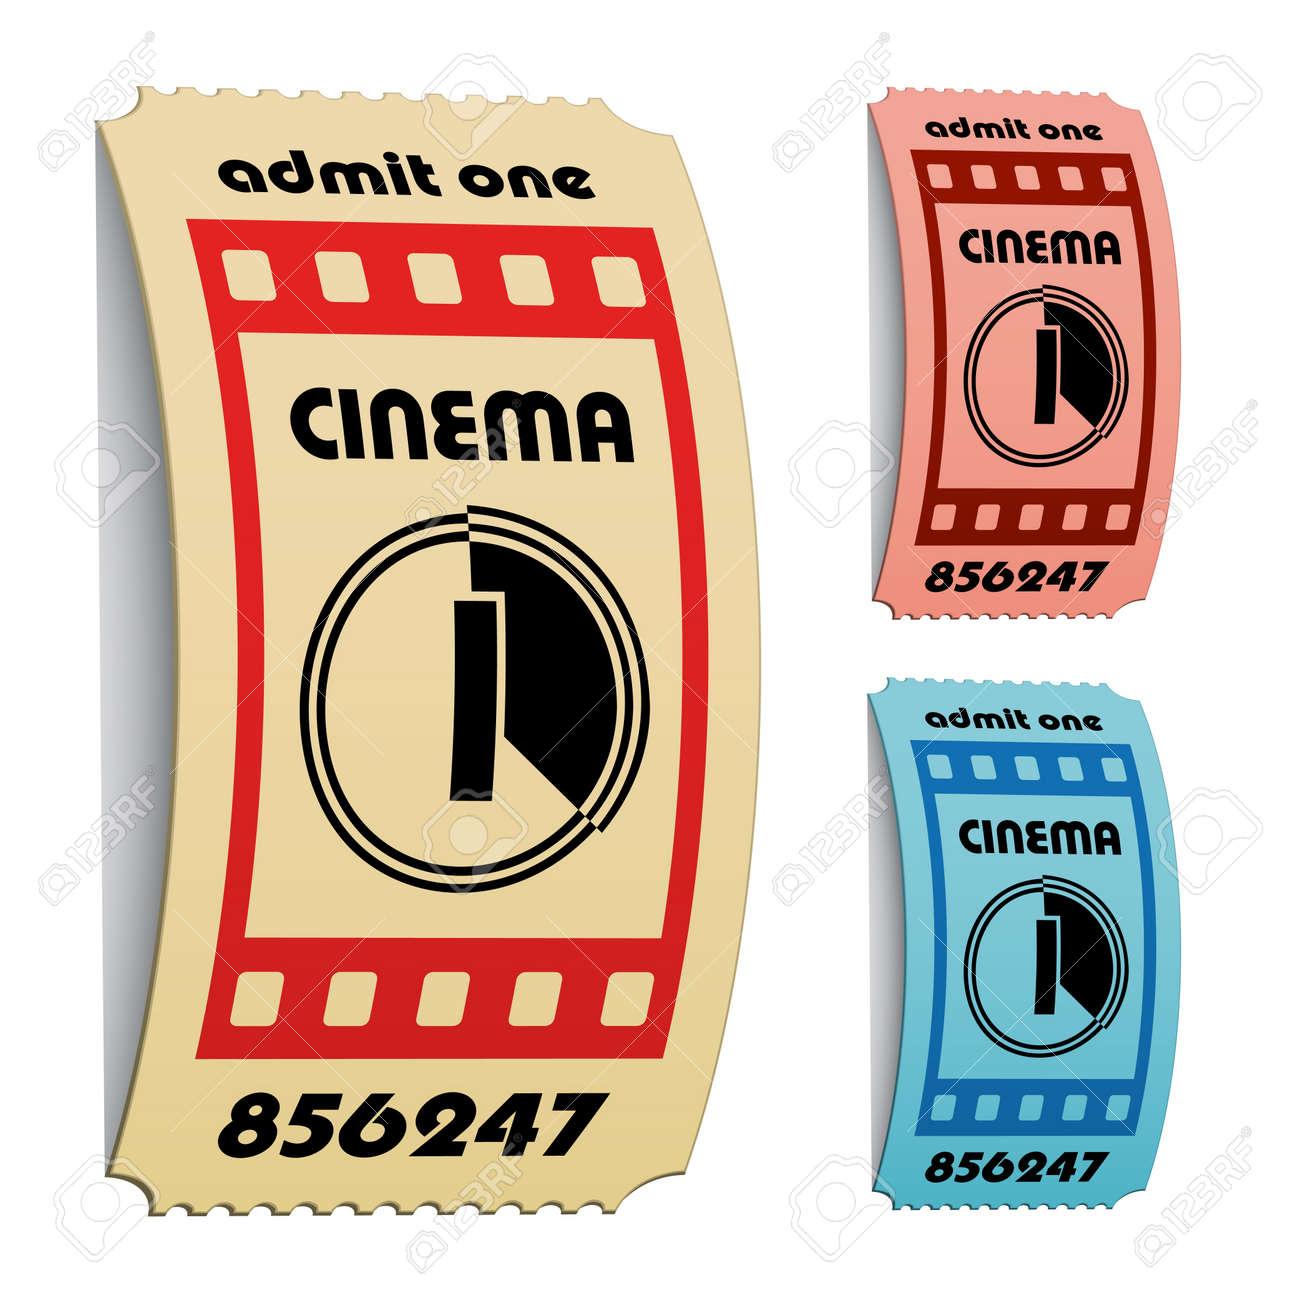 vector 3d curled cinema tickets Stock Vector - 11504812